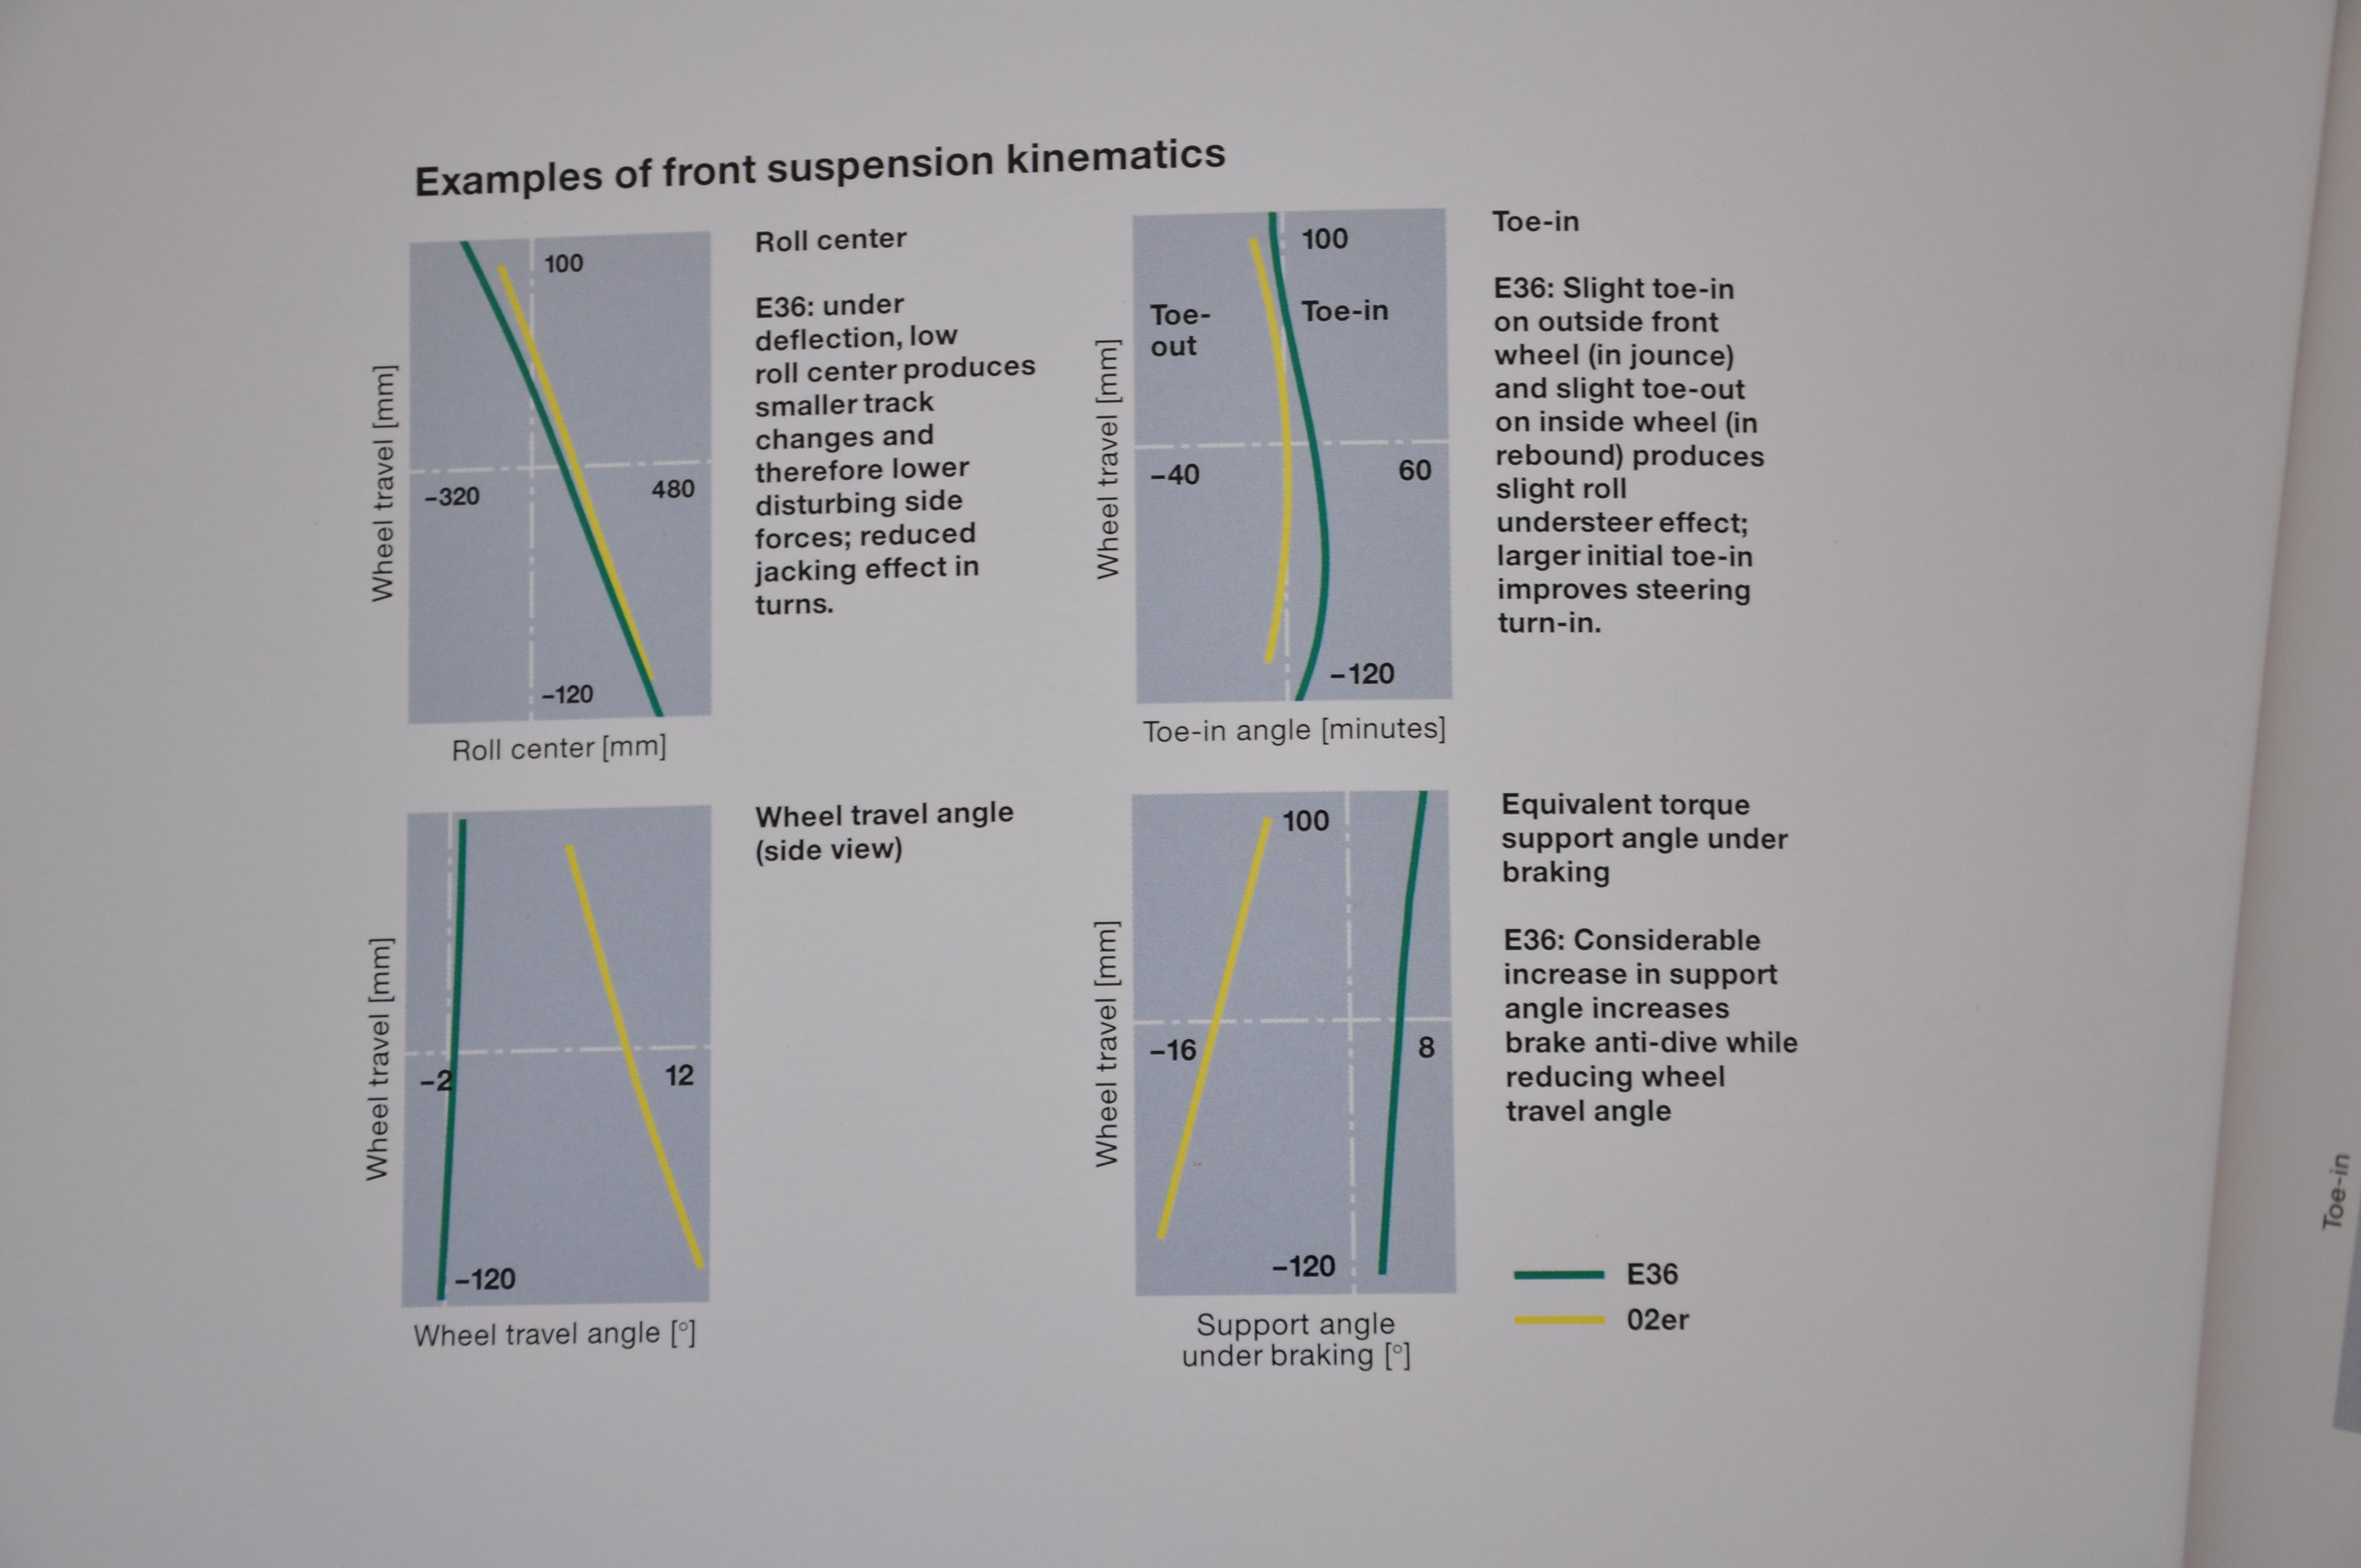 3 Series Suspension Kinematics  Elastokinematics  Axle